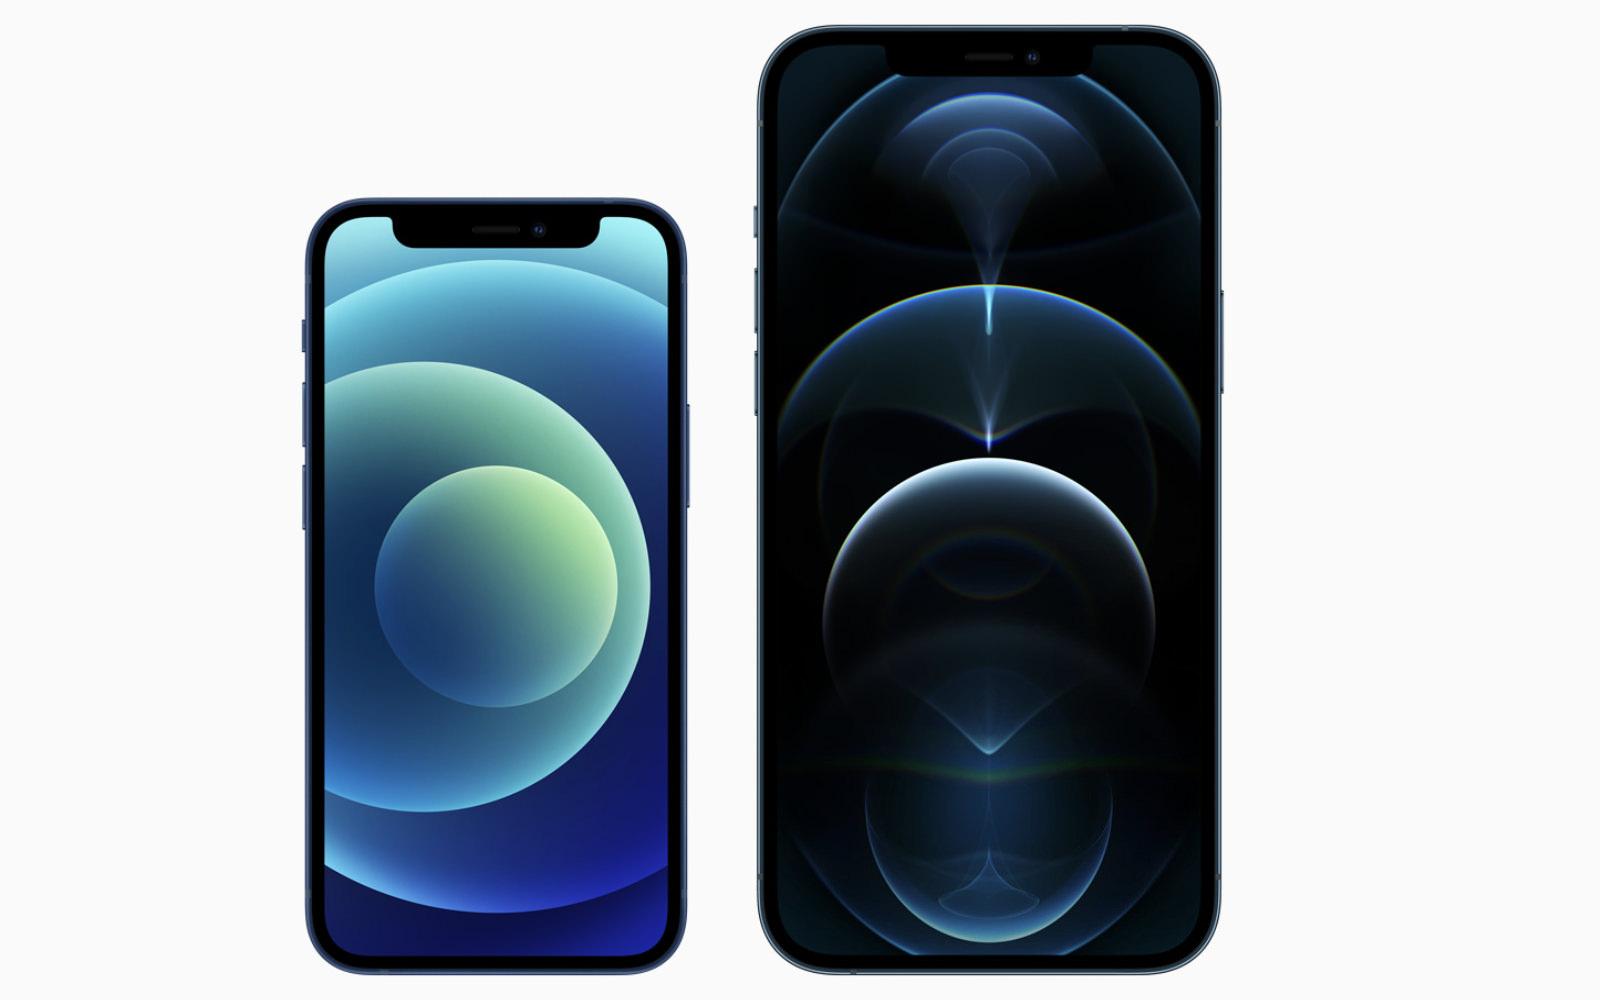 Iphone 12 mini and 12 pro max